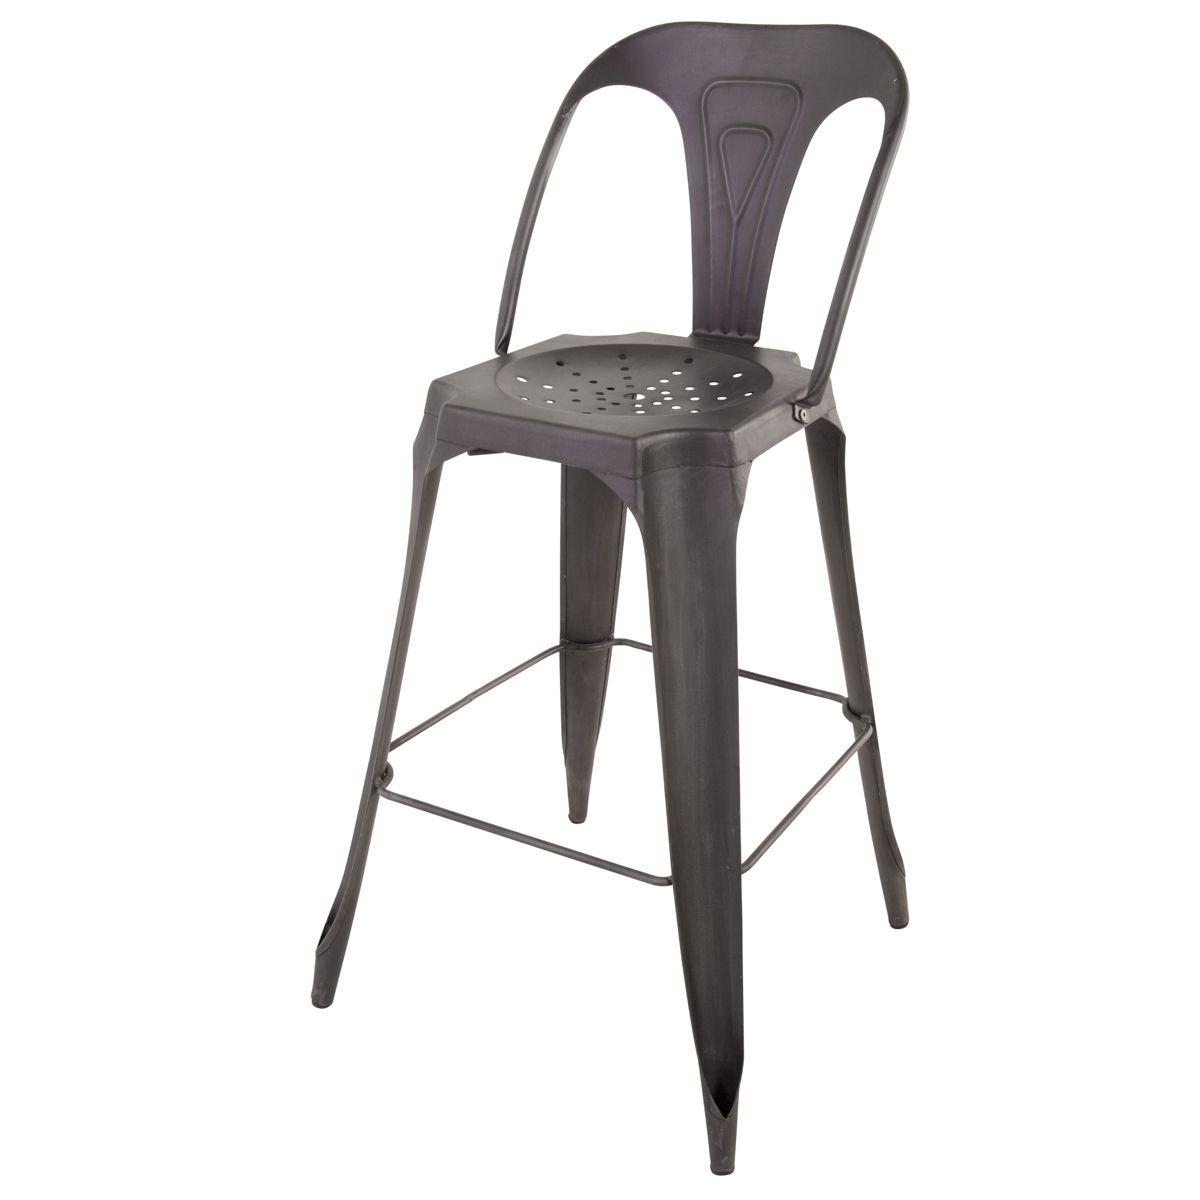 Chaise de bar industrielle en métal